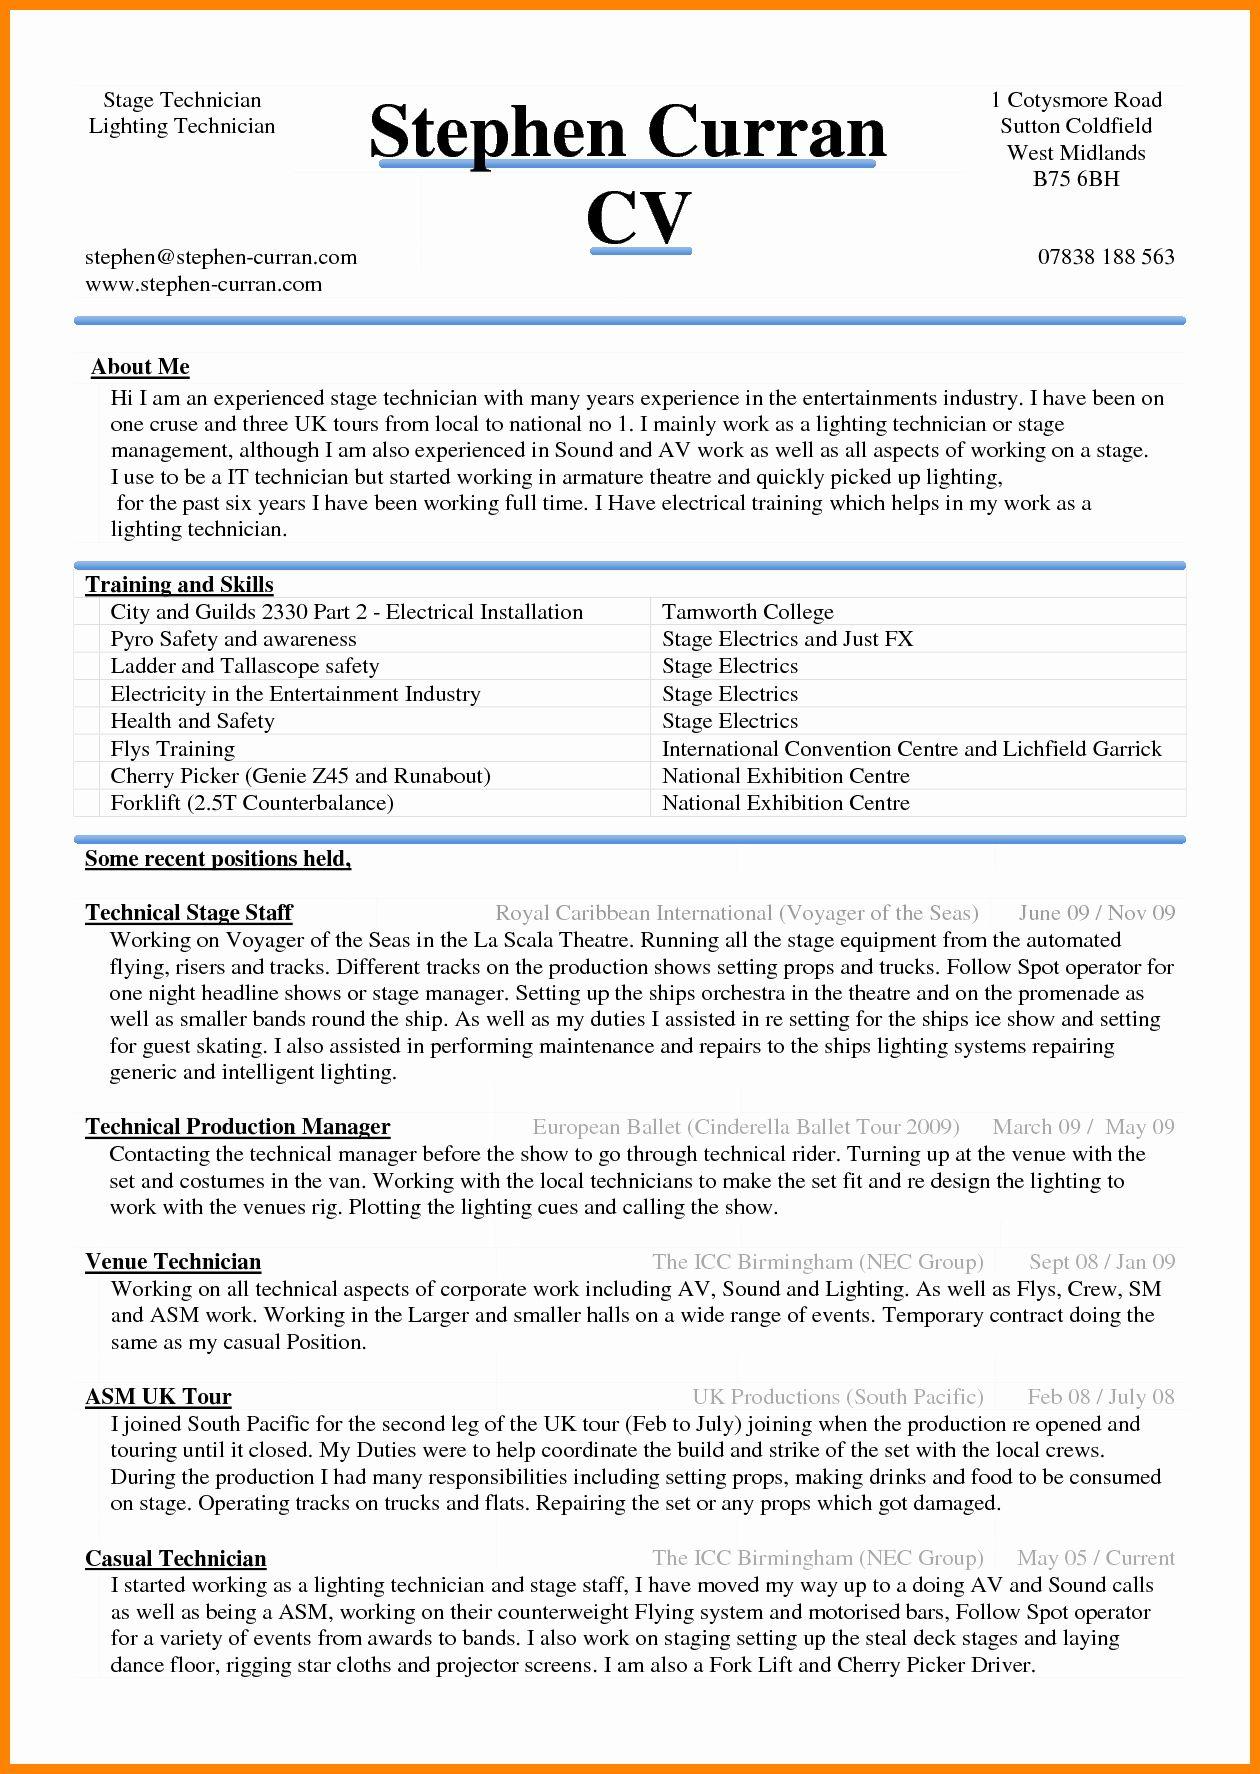 Curriculum Vitae Template Word Lovely 6 Curriculum Vitae In Ms Word Best Resume Template Resume Template Word Curriculum Vitae Template